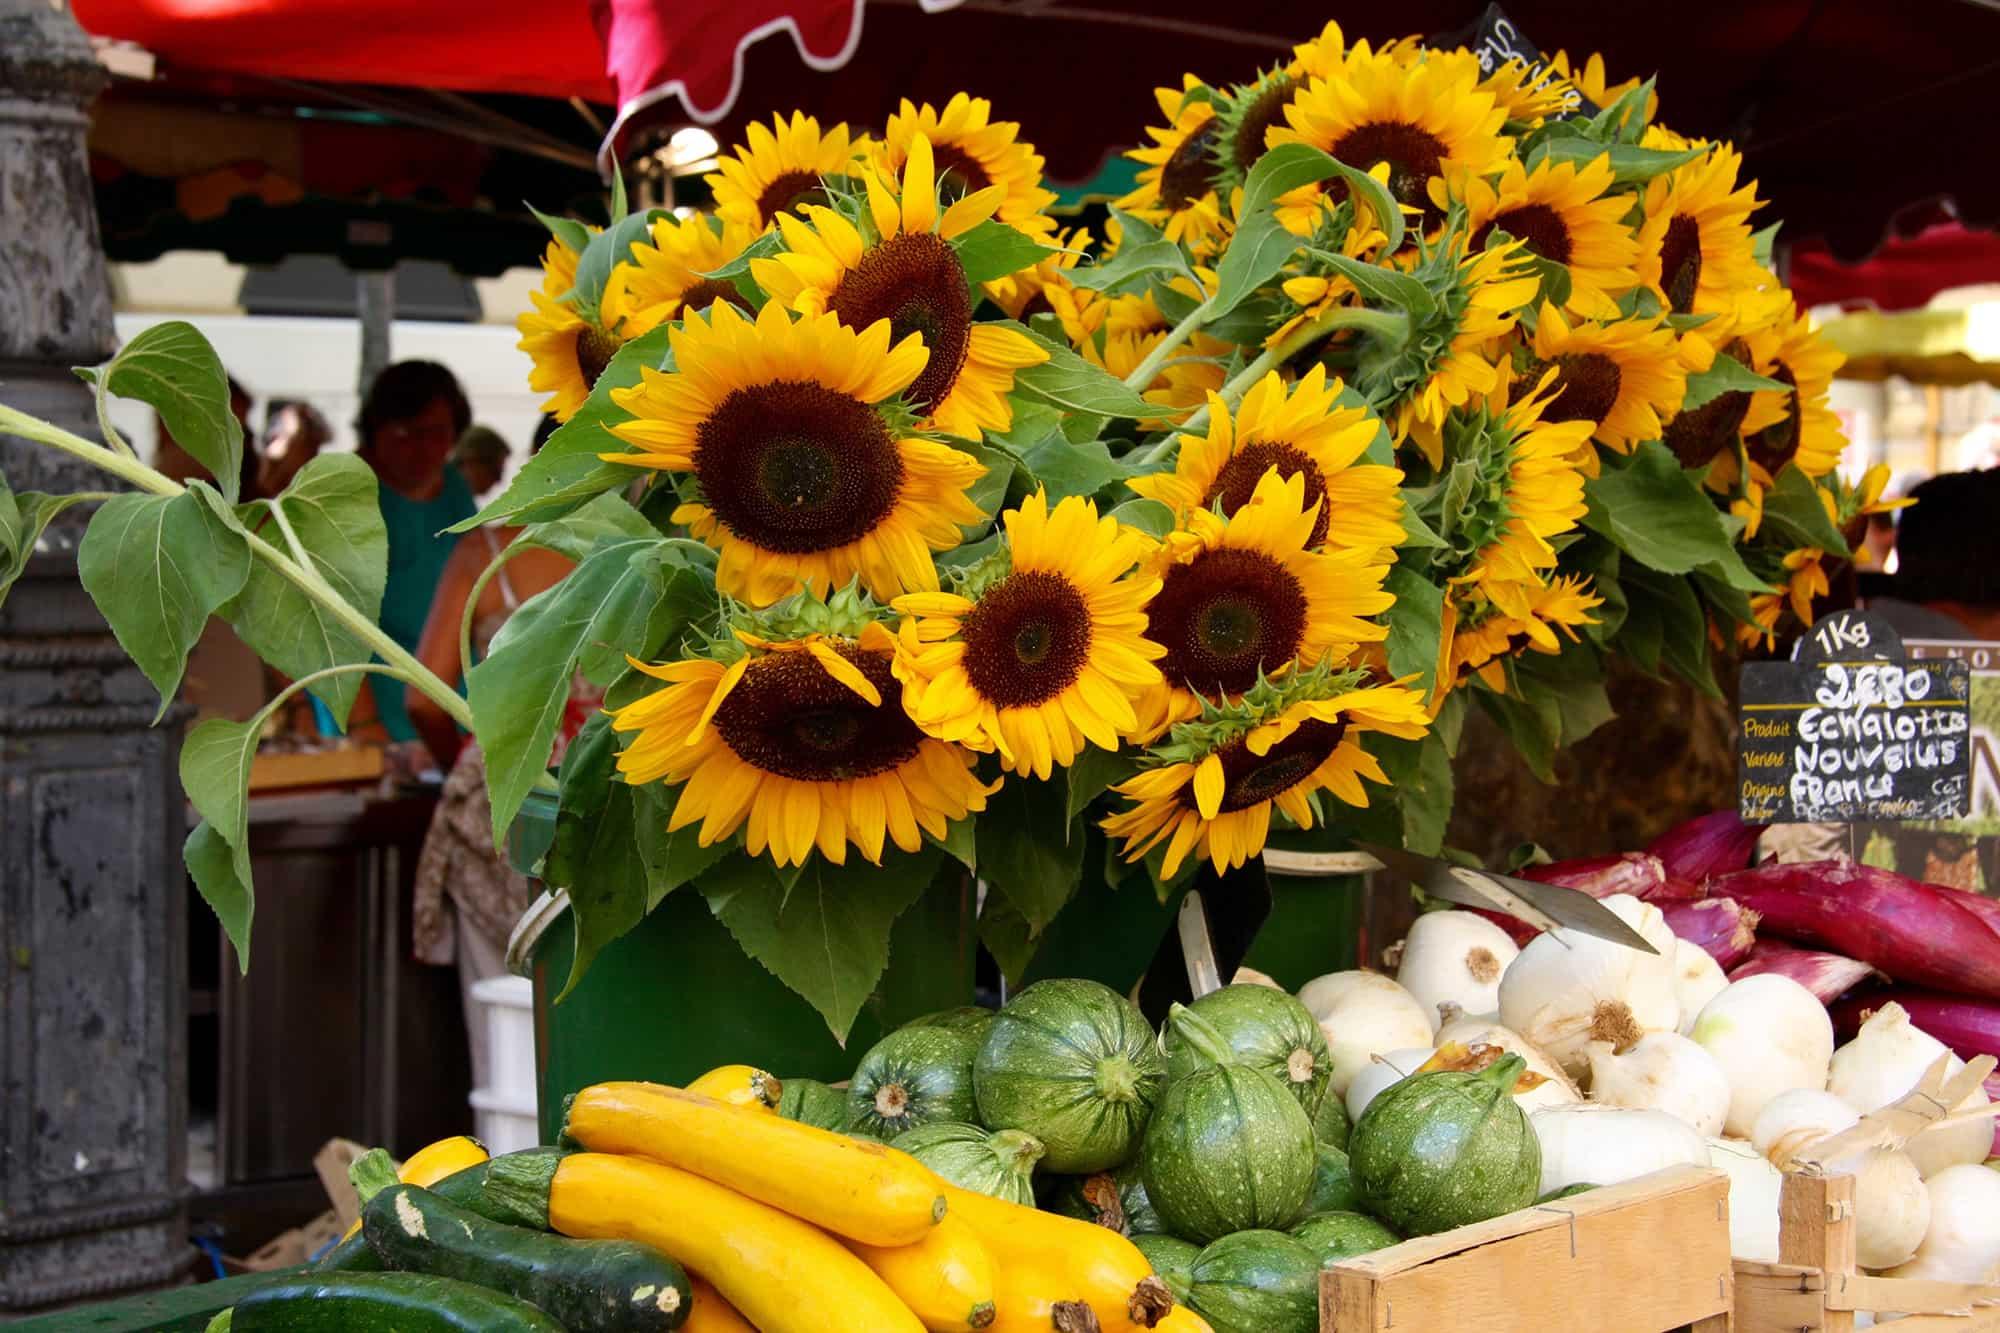 marché aix en provence